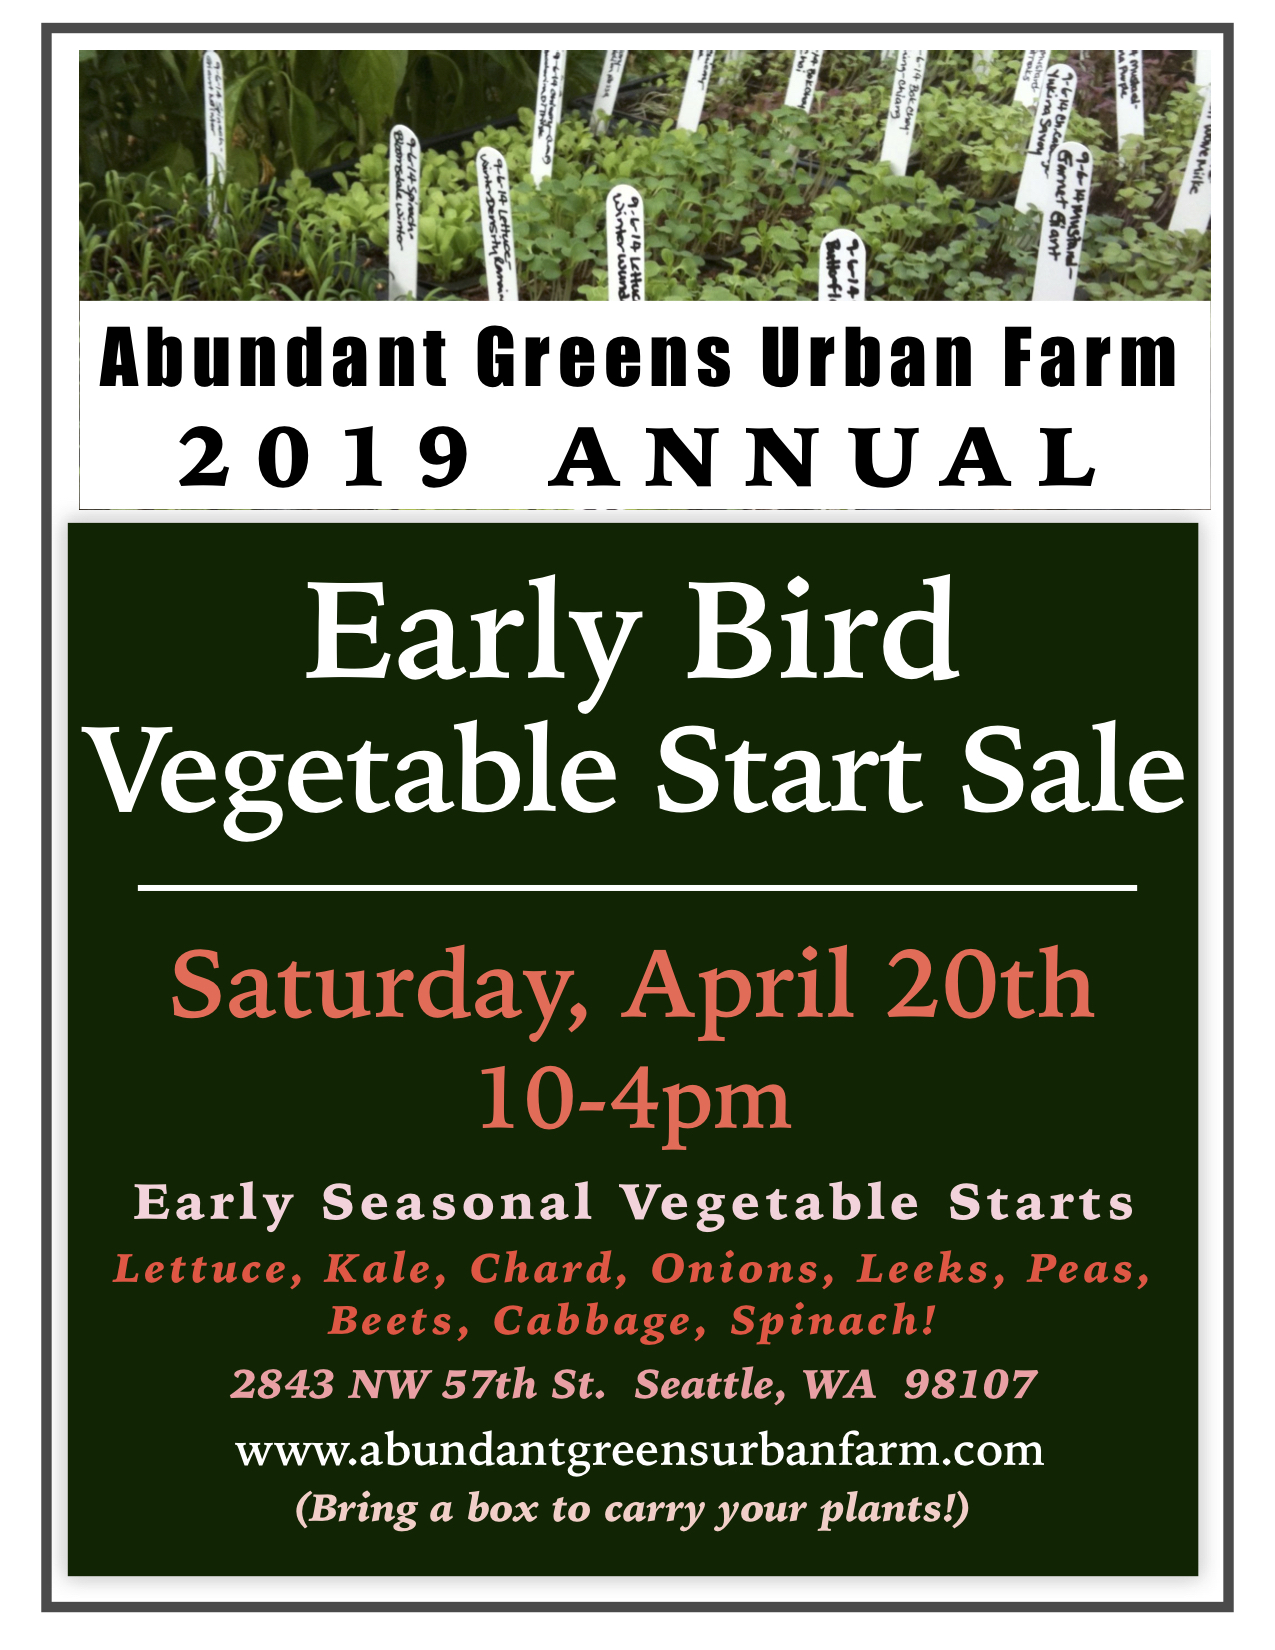 2019 Early Bird Vegetable Start Sale   Abundant Greens Urban Farm